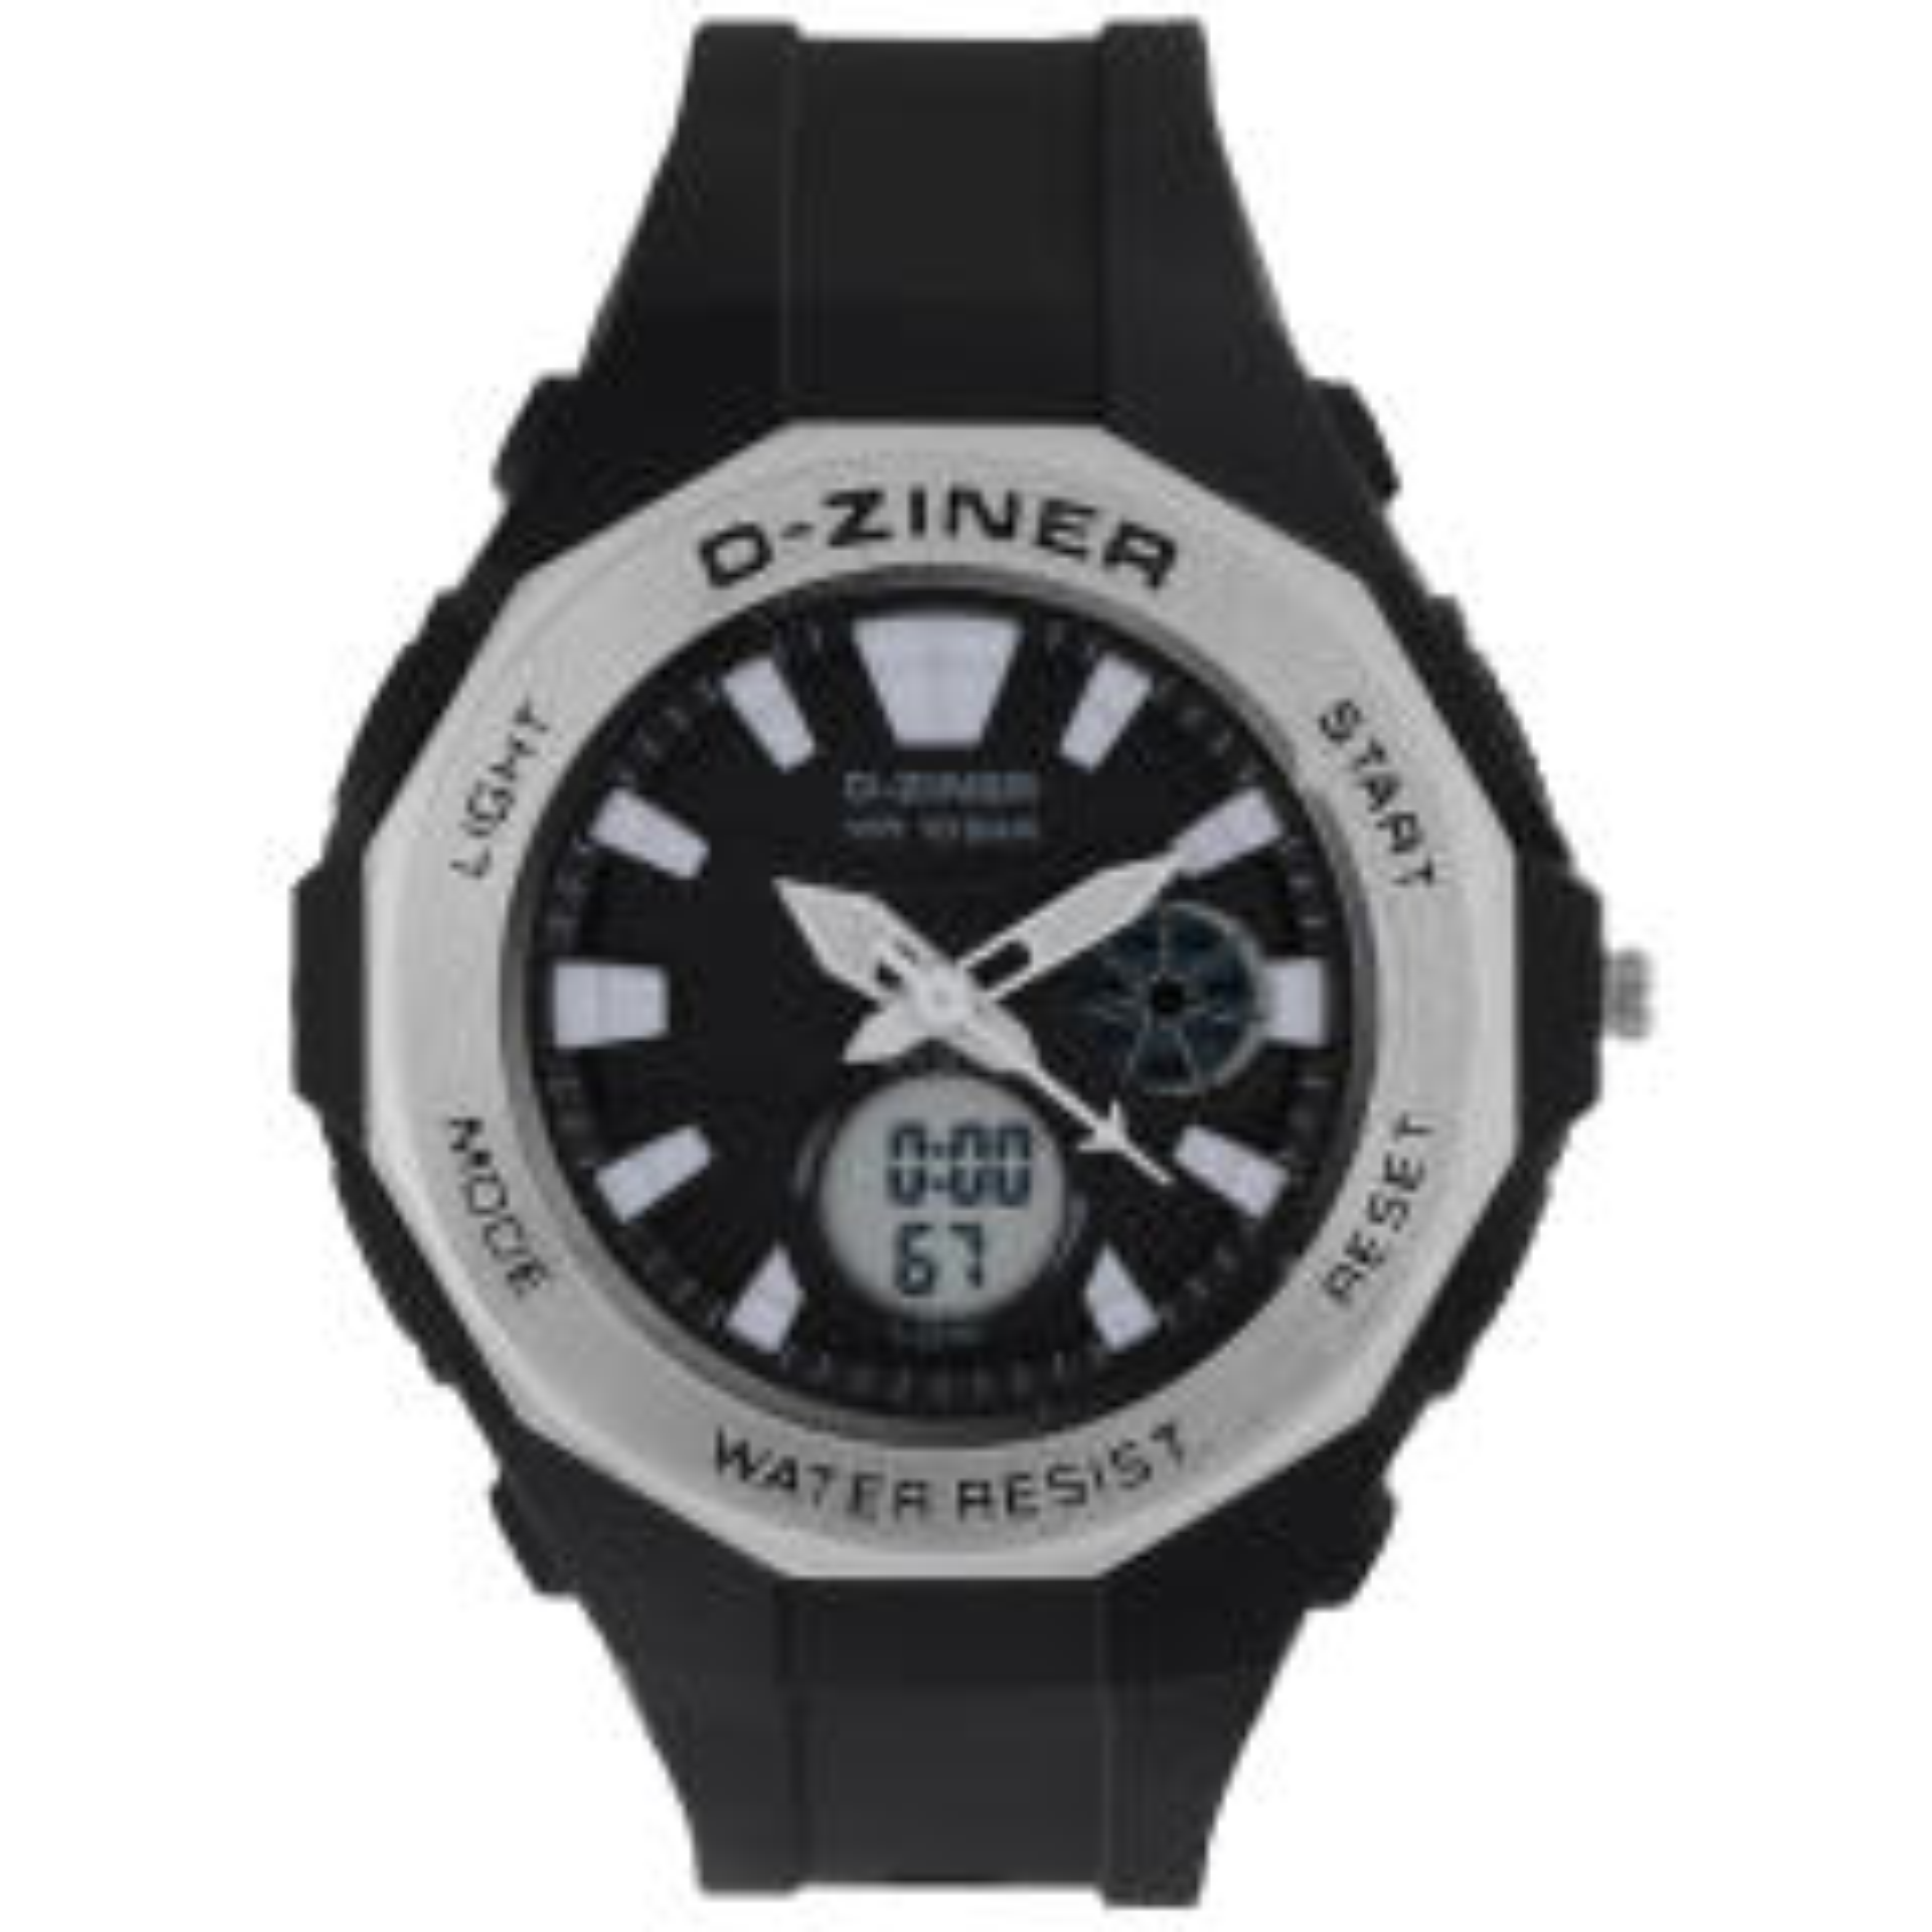 ساعت مچی عقربه ای دیزاینر مدل D-Z7005 31